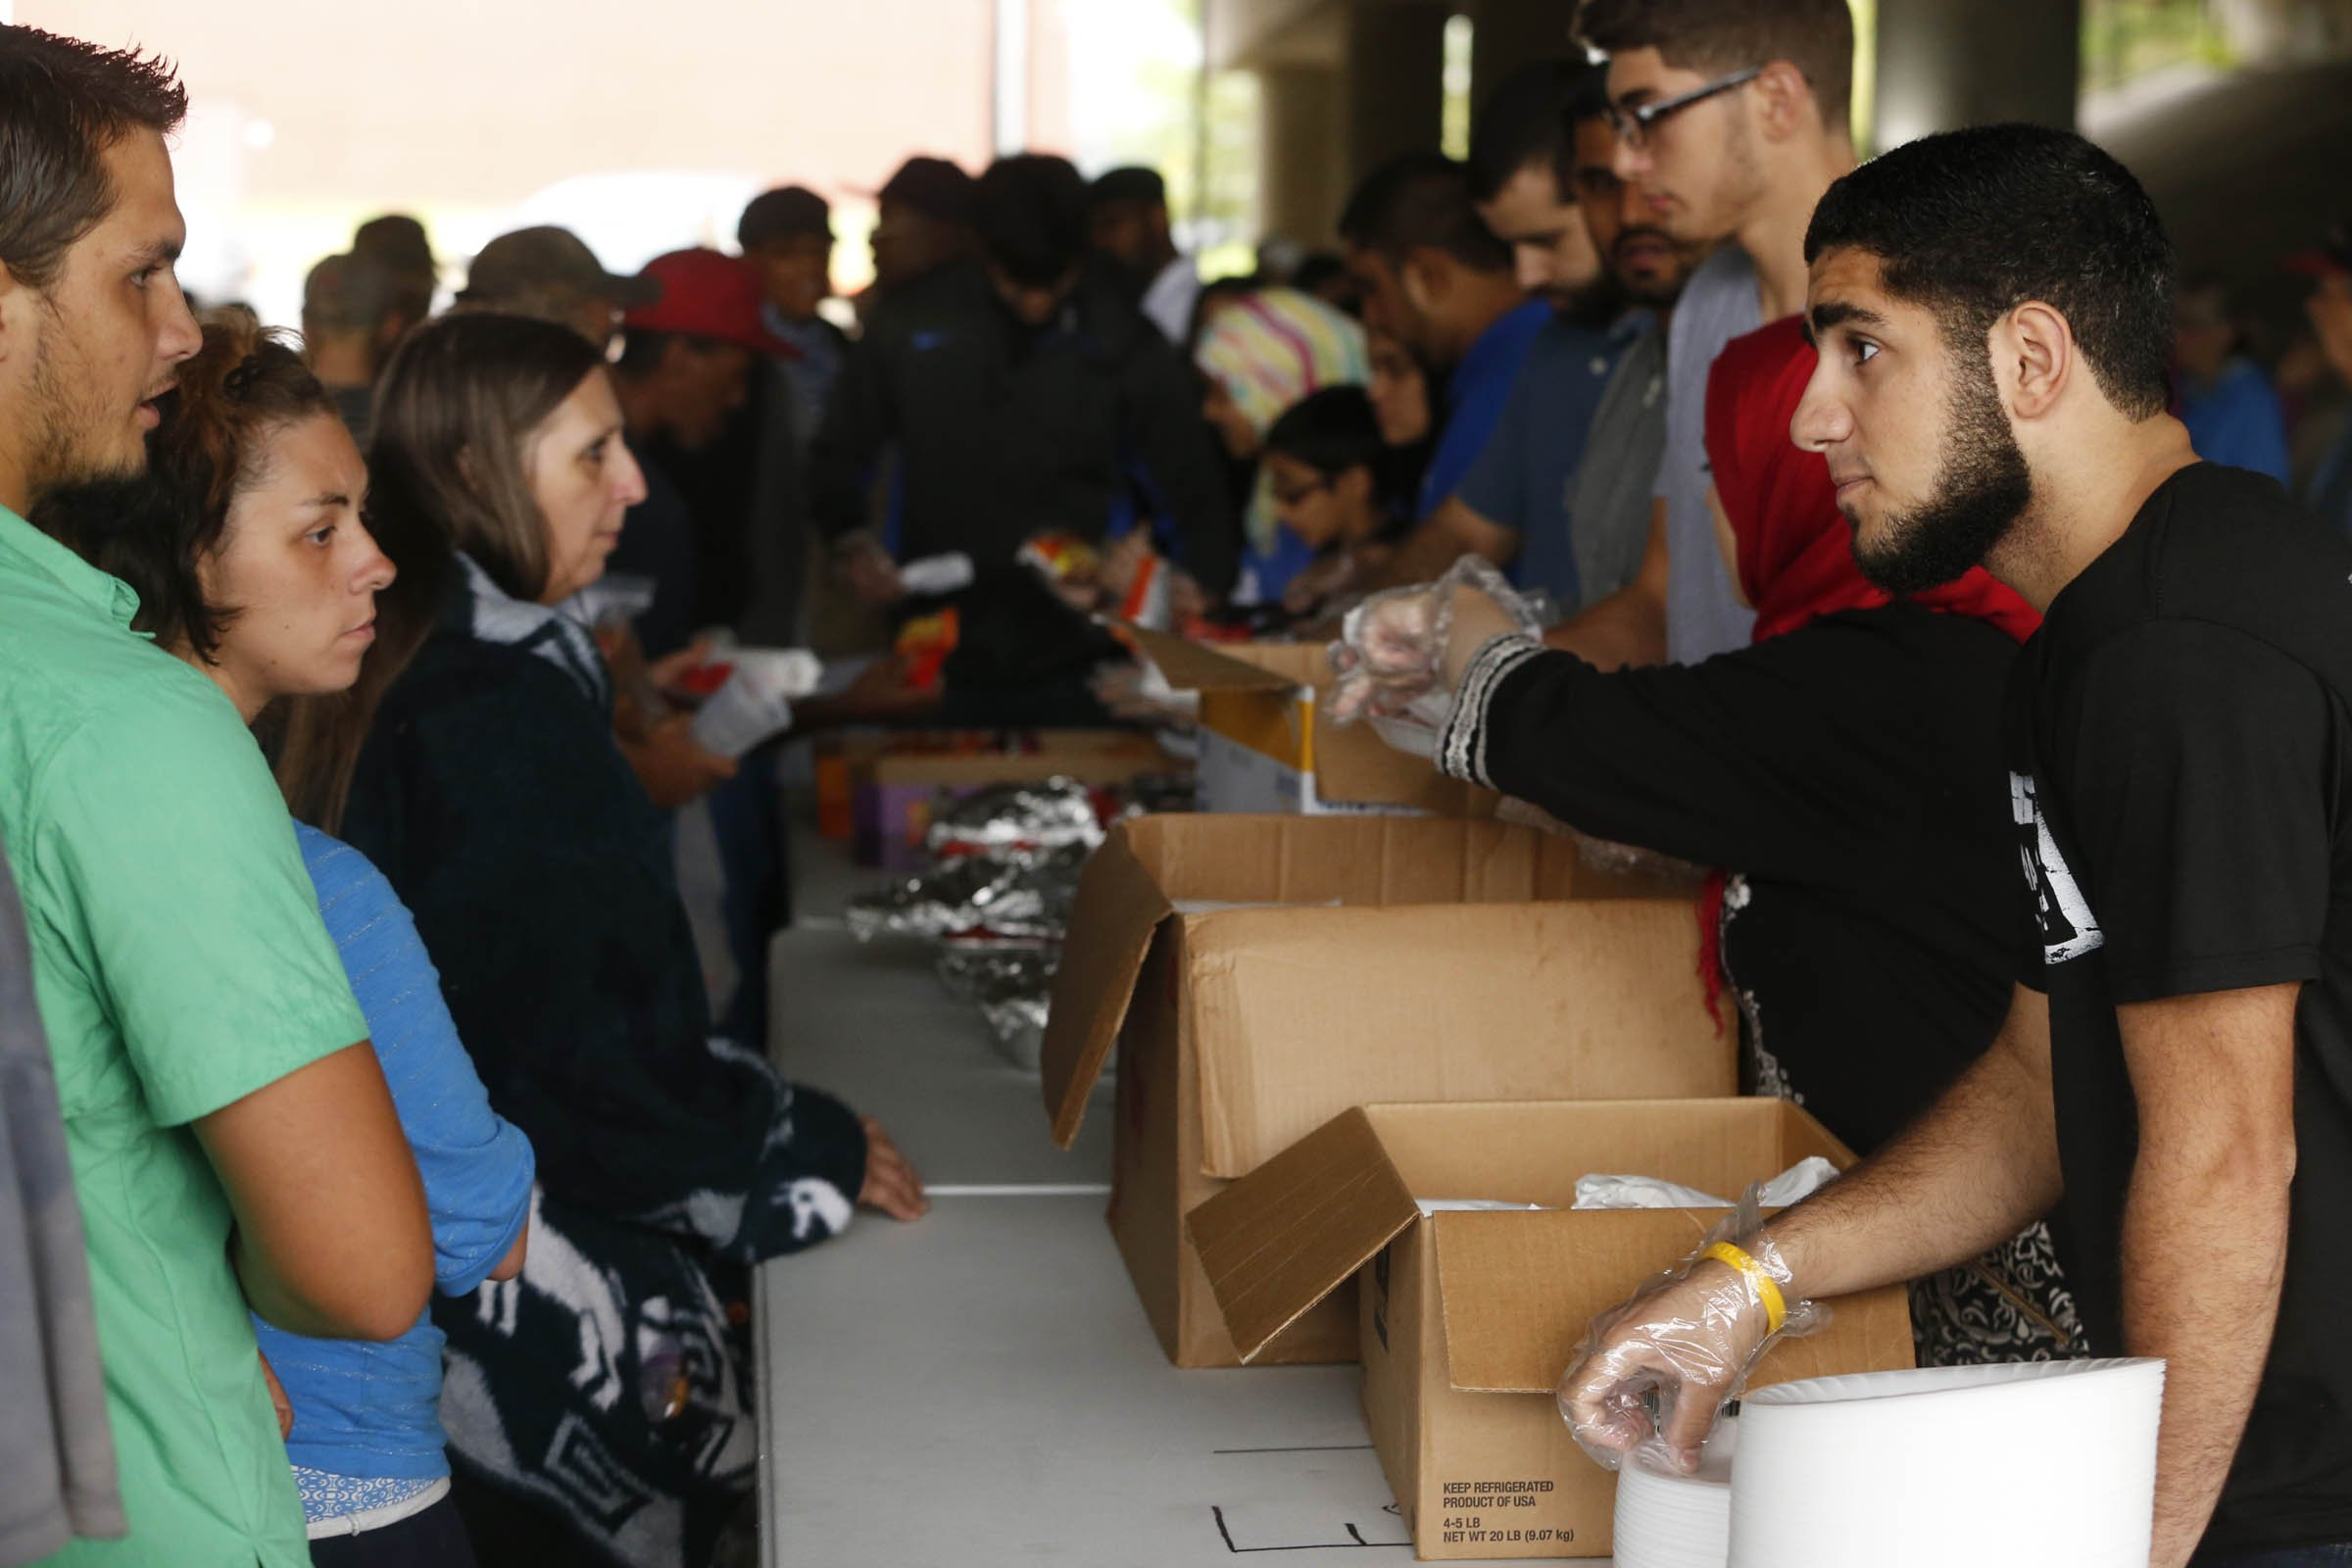 Voluntários distribuindo alimentos aos necessitados (James Gibbard/Tulsa World)